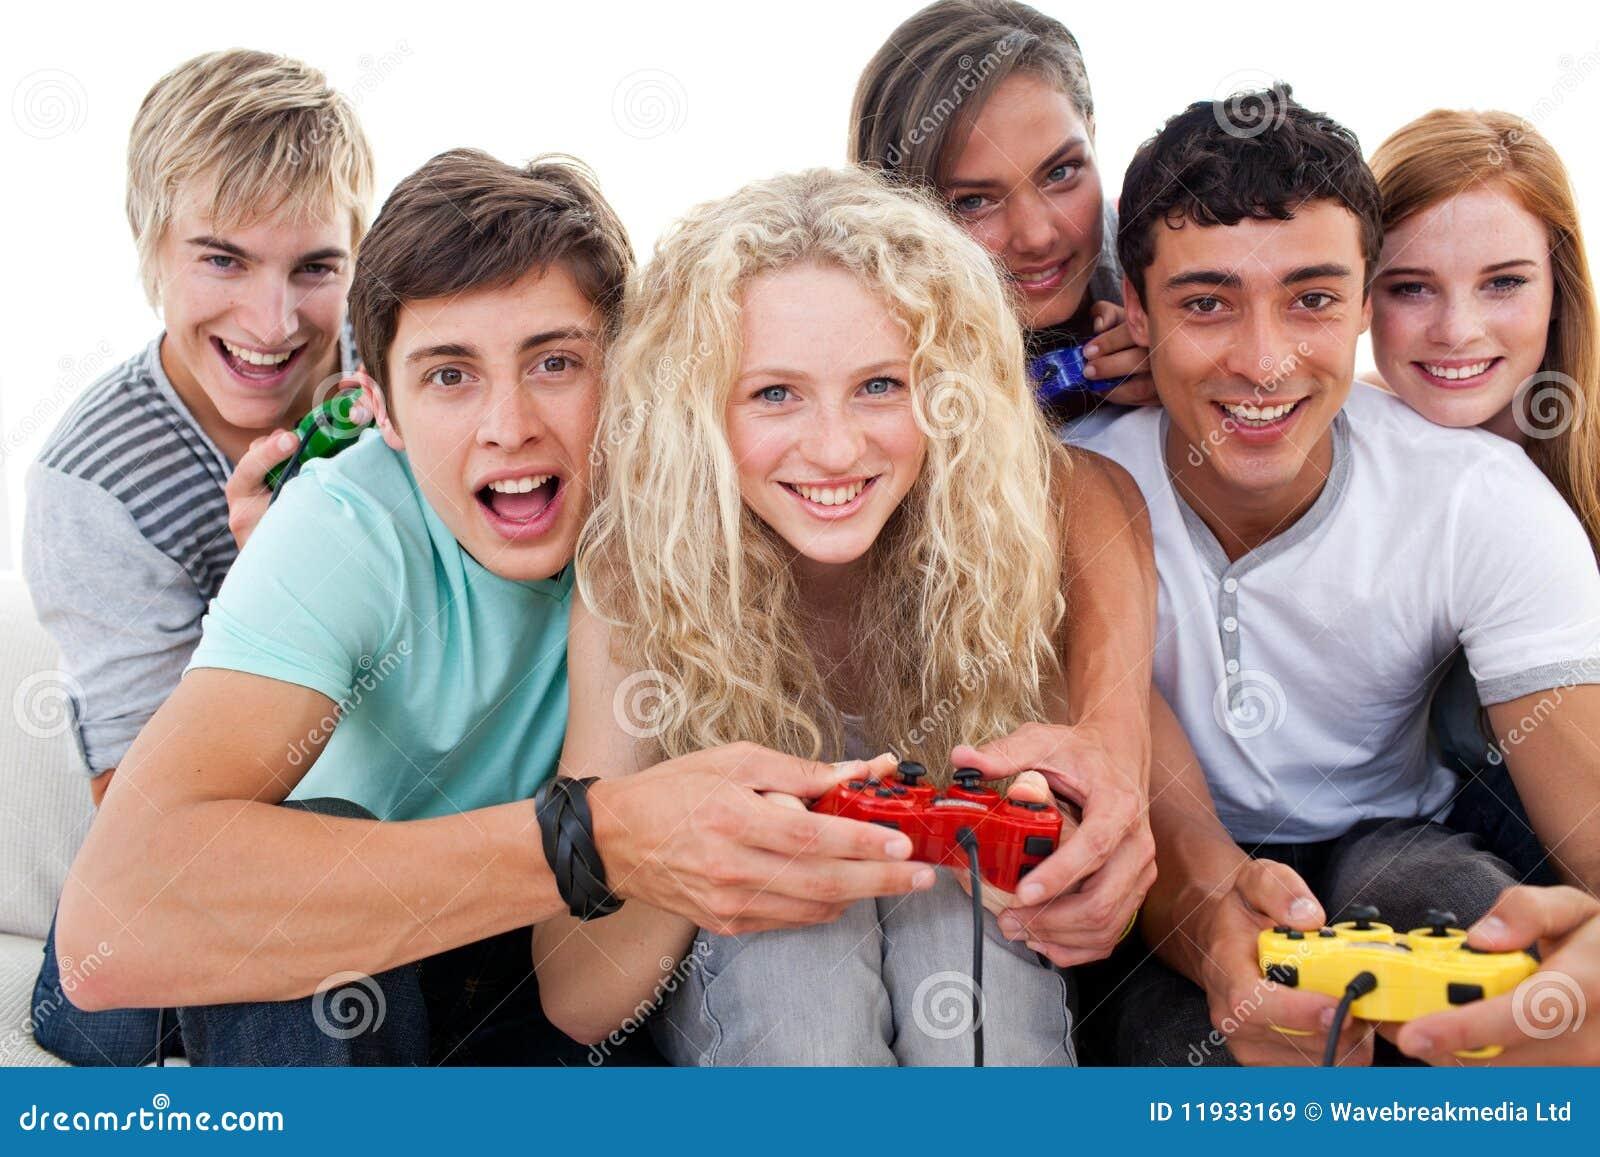 Seniors enjoying teen